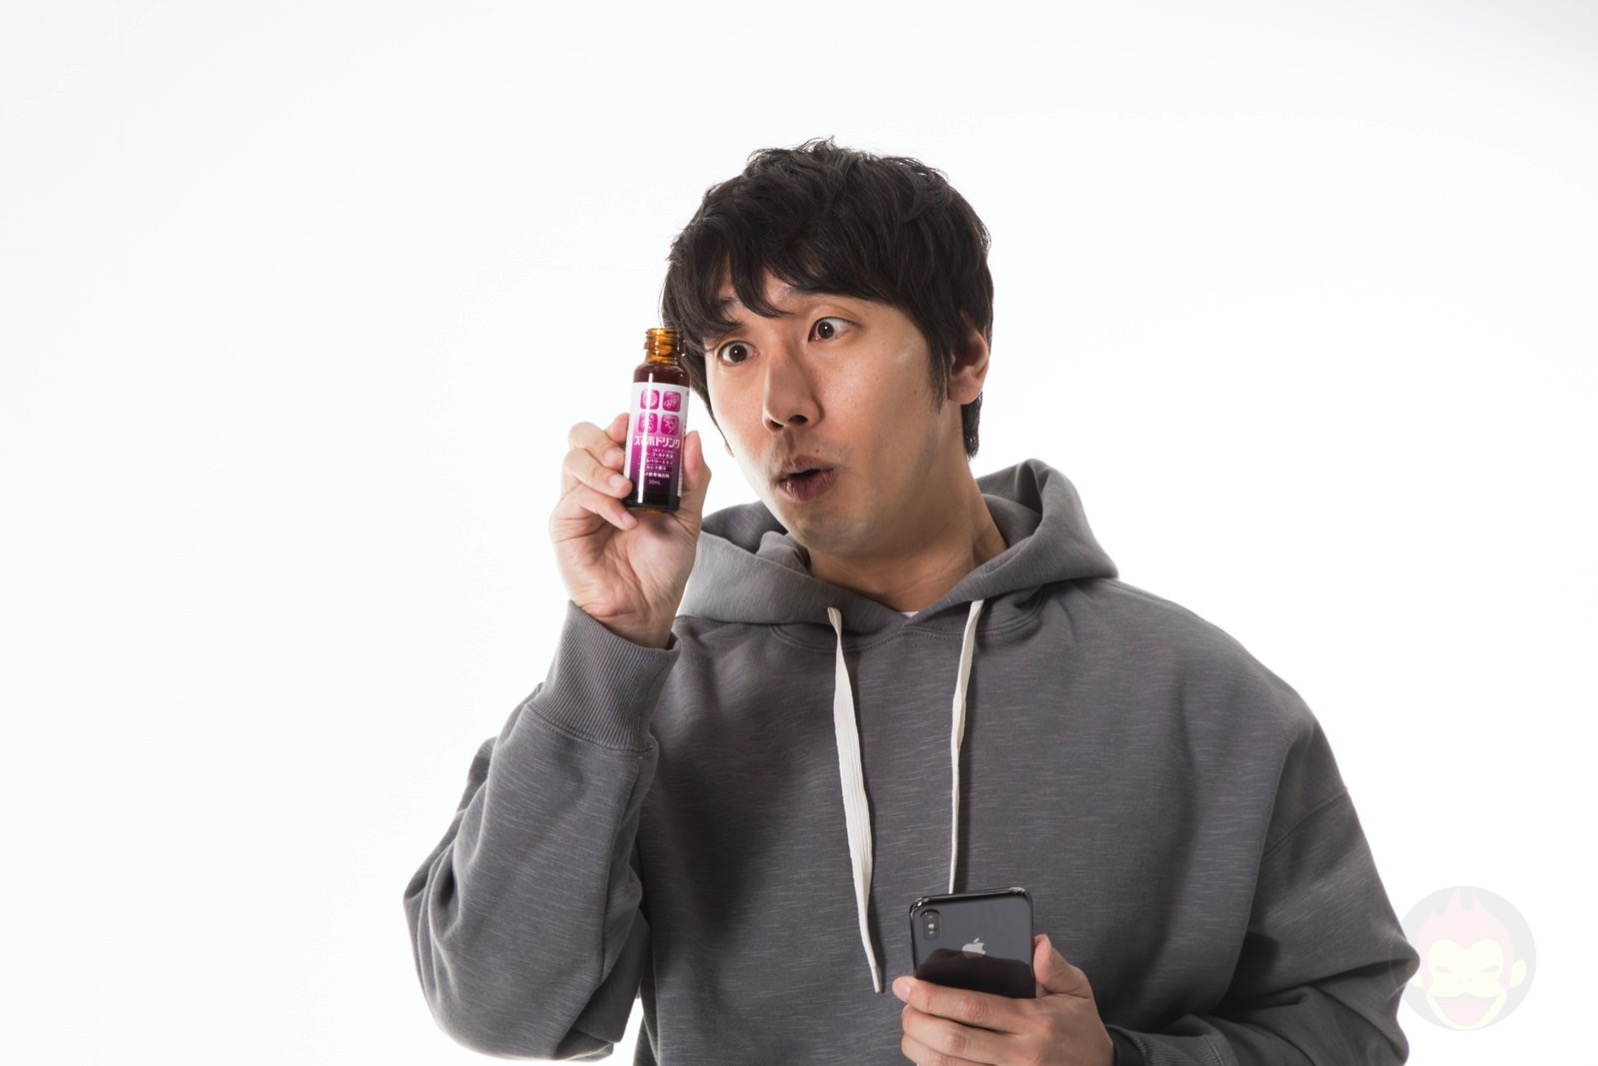 sumaho-drink-20.jpg